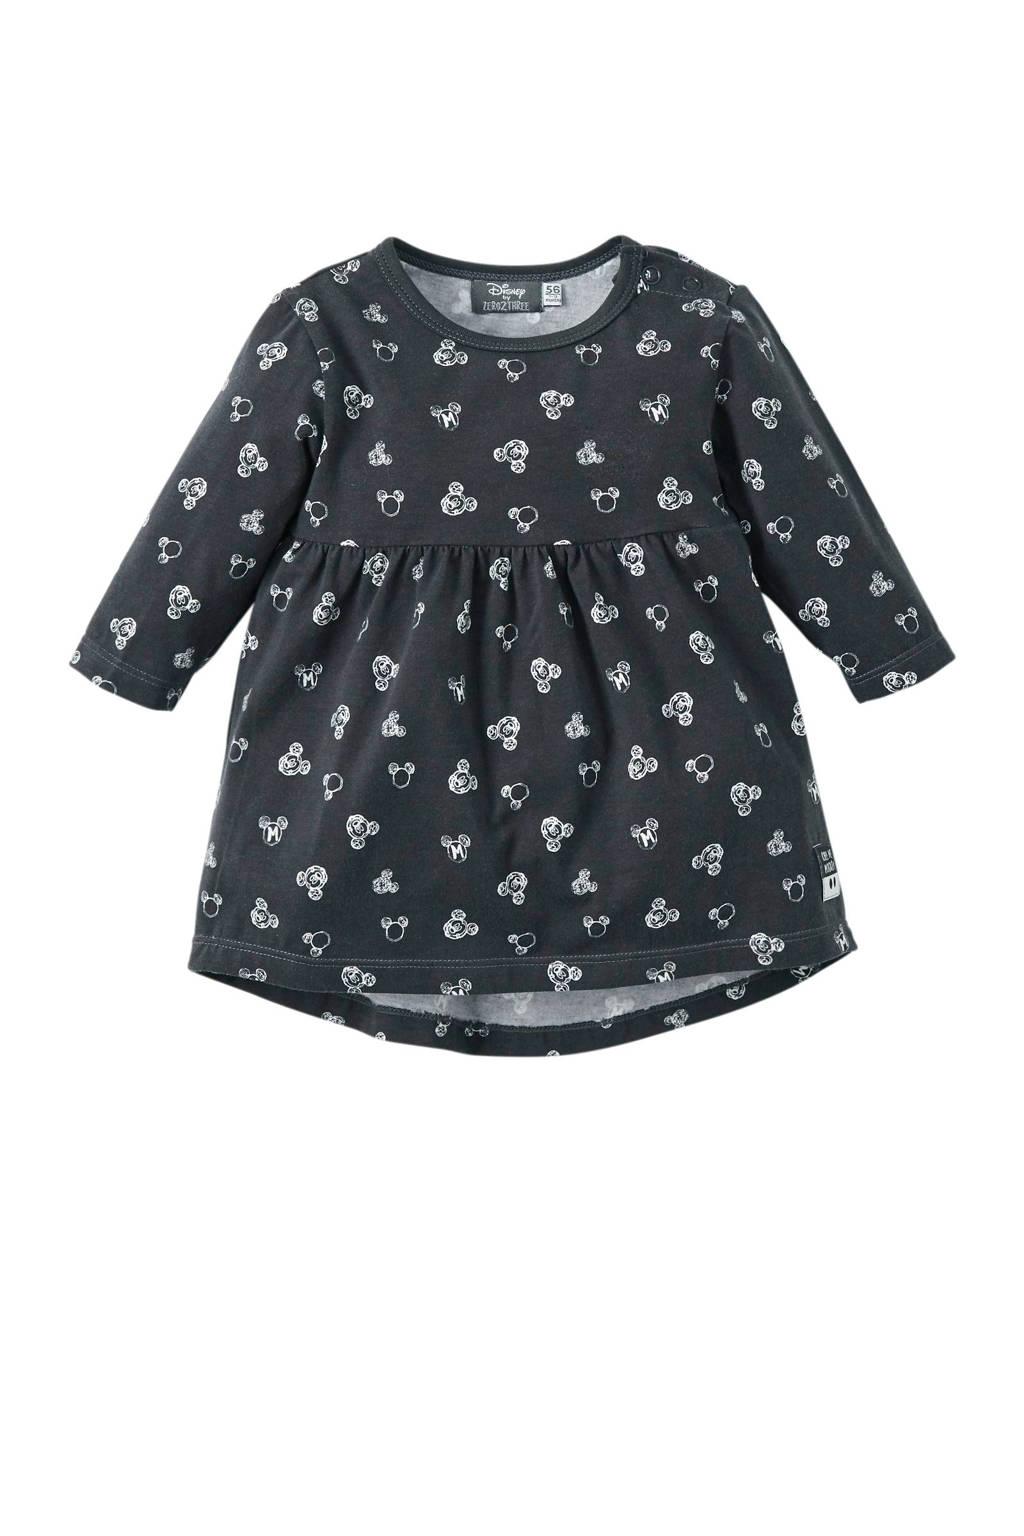 Zero2three newborn Mickey Mouse jurk grijs, Antraciet